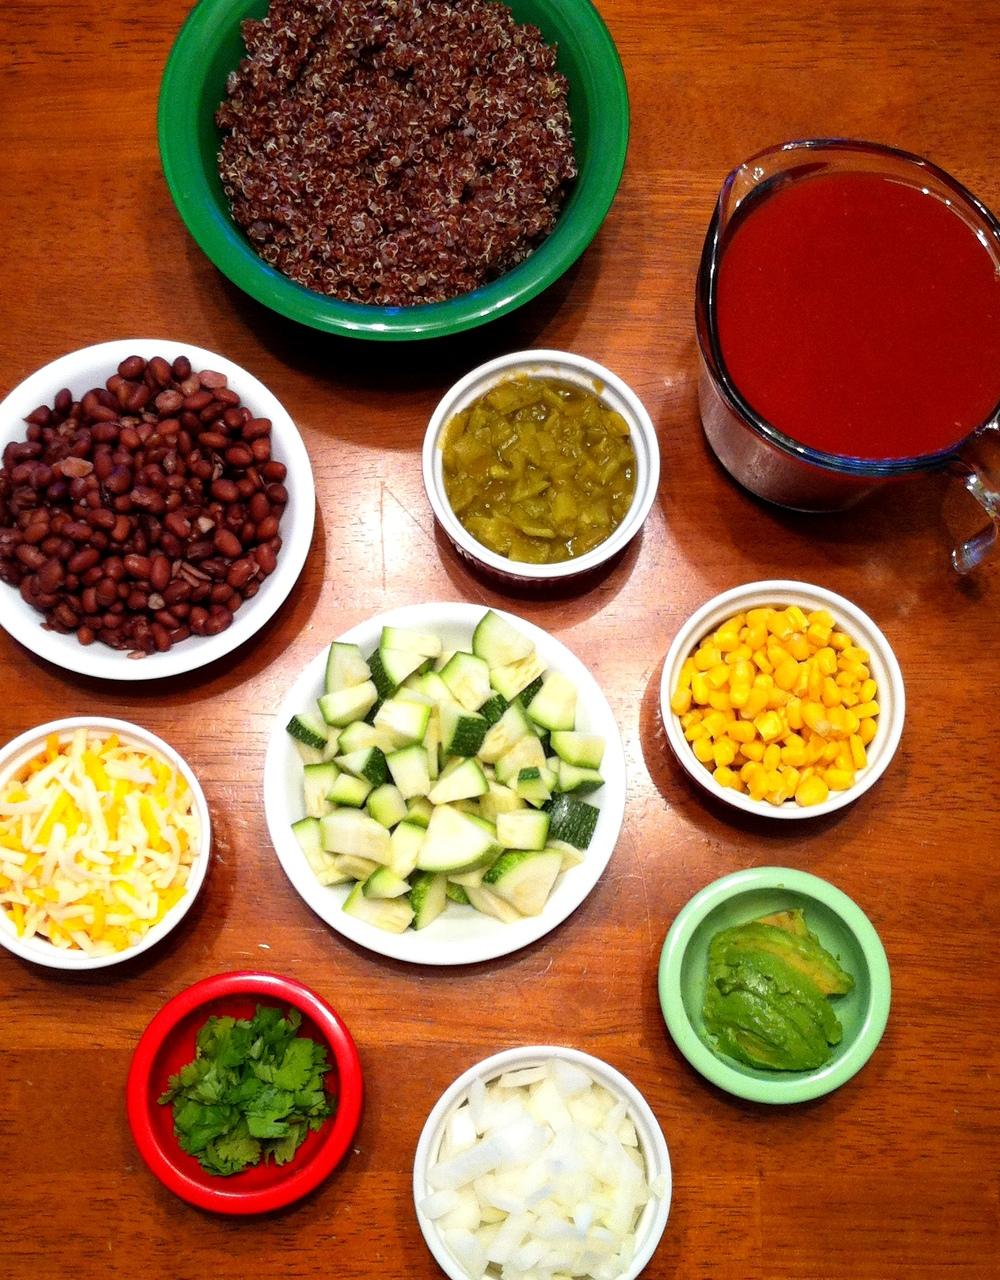 Quinoa Enchilada Bake Ingredients